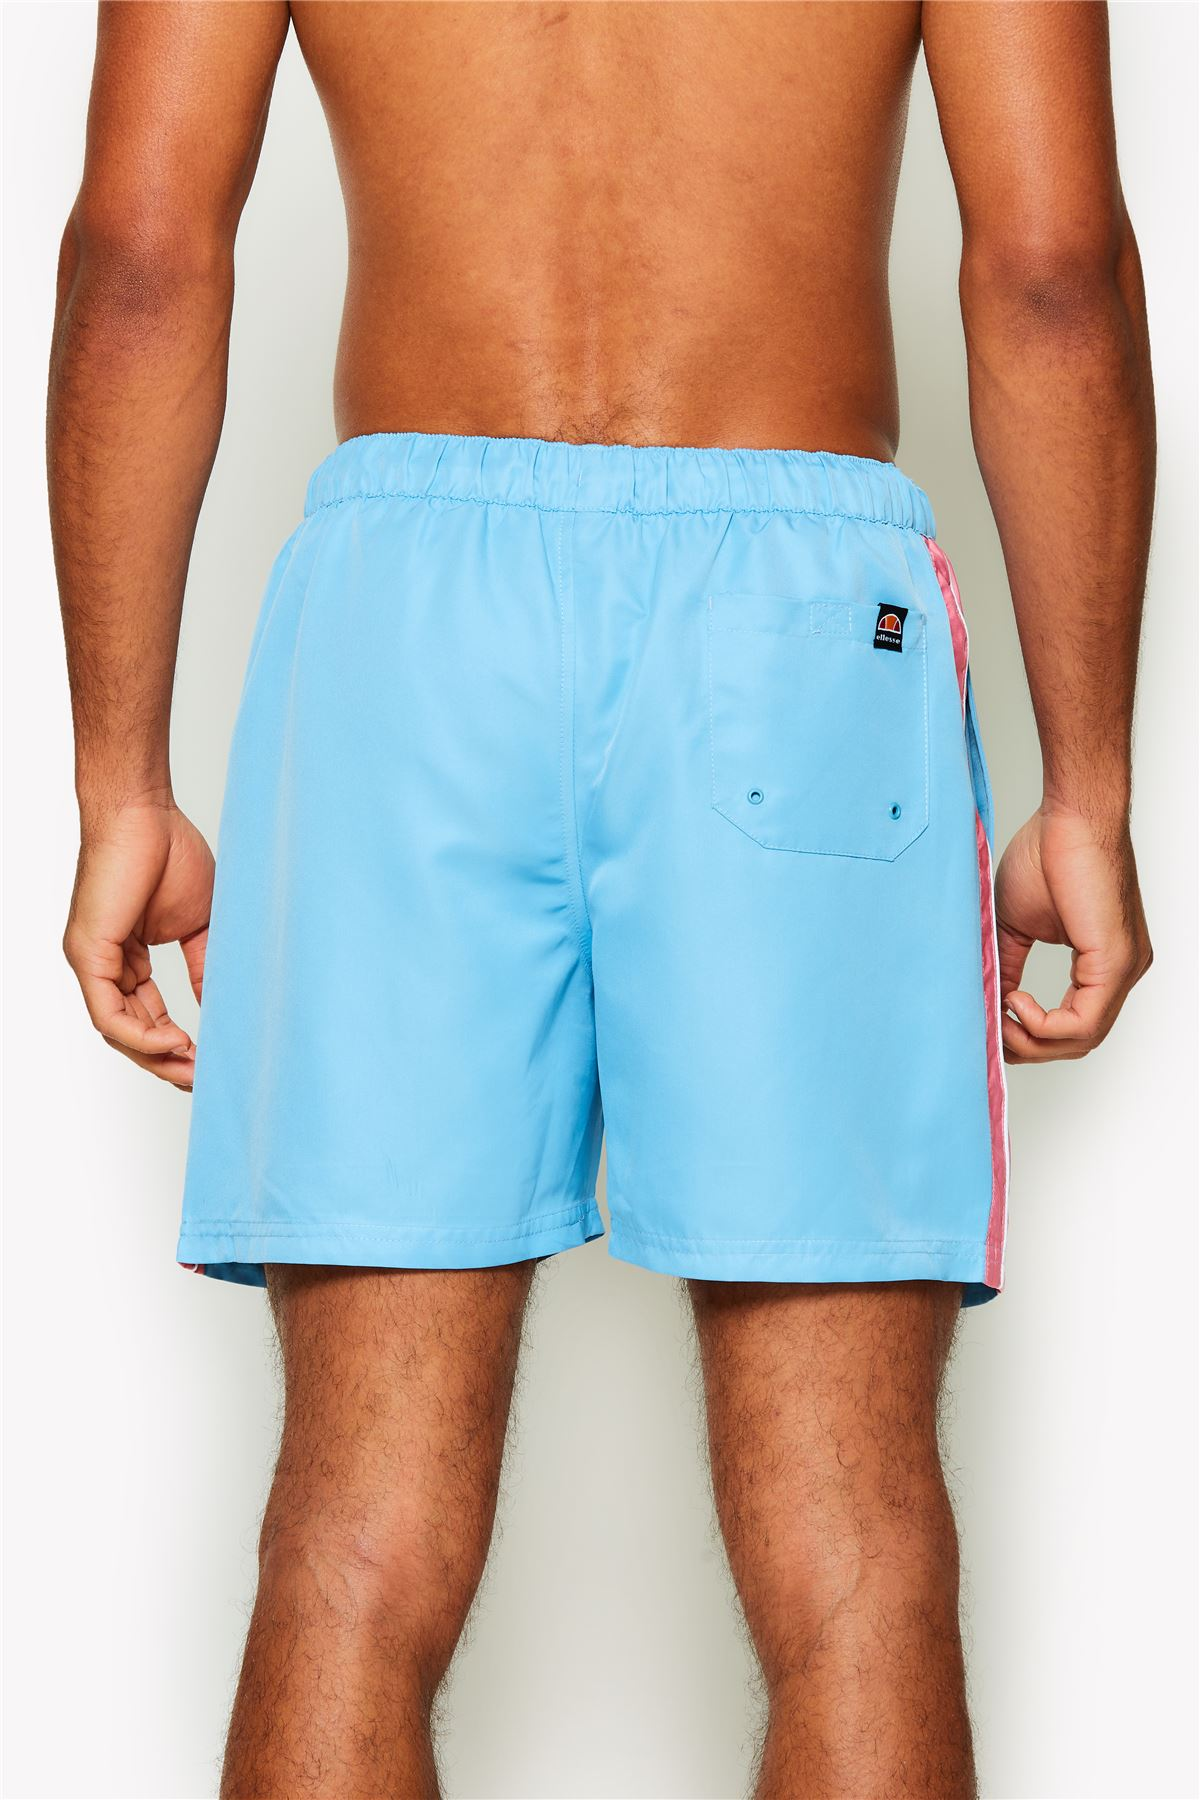 5c41bd809a Ellesse Nasello Beach, Pool Swim Short in Pastel Blue, Pink, Purple ...